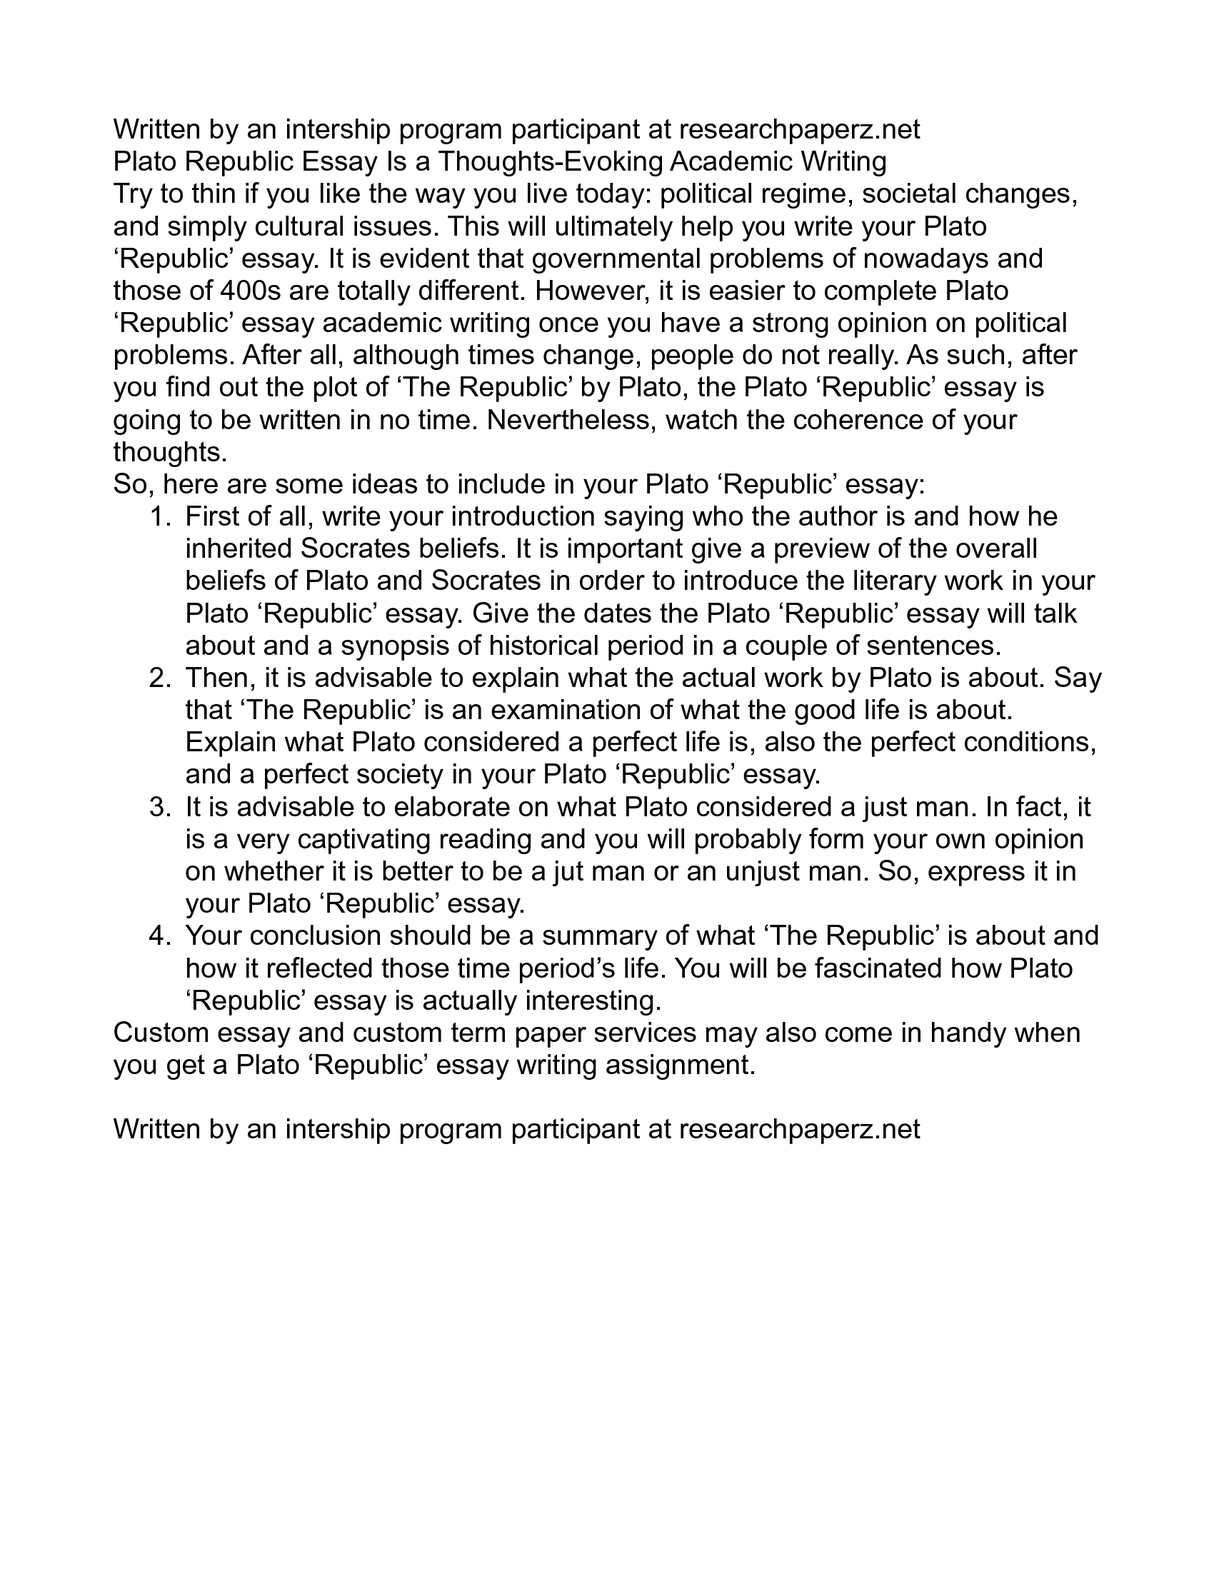 Platos writings essay